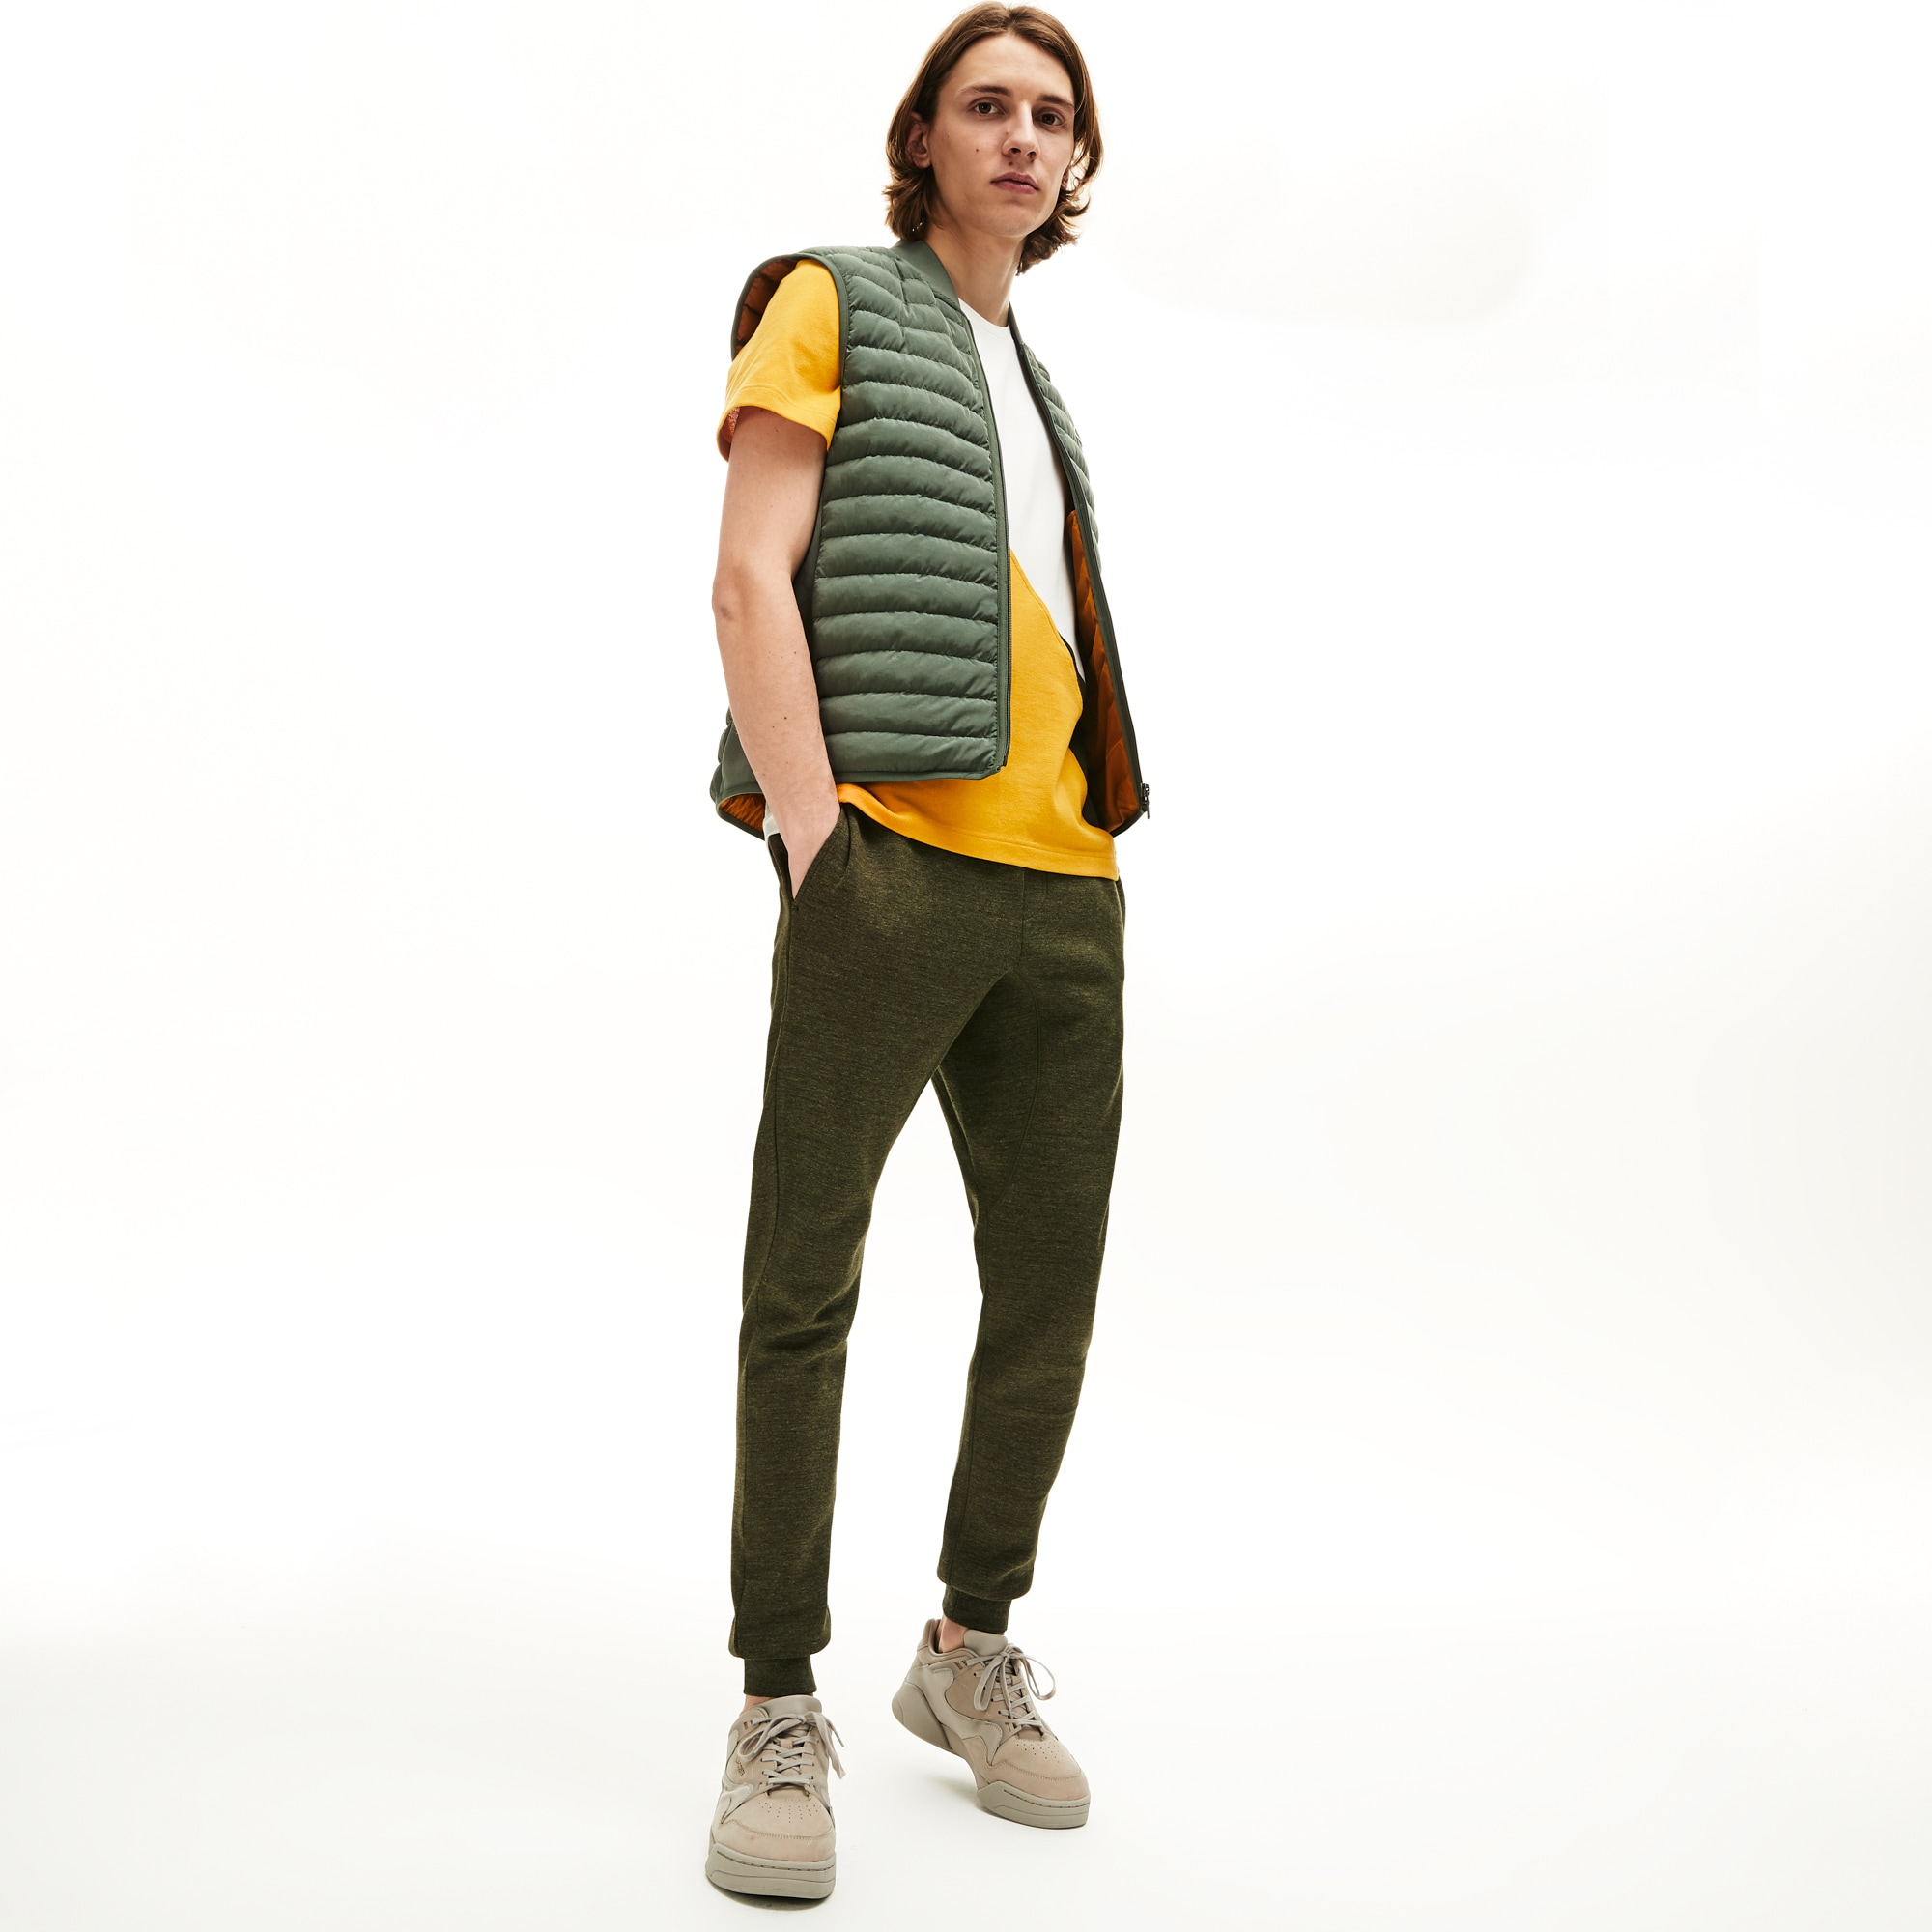 Lacoste Pants Men's Lacoste SPORT Tennis Fleece Trackpants